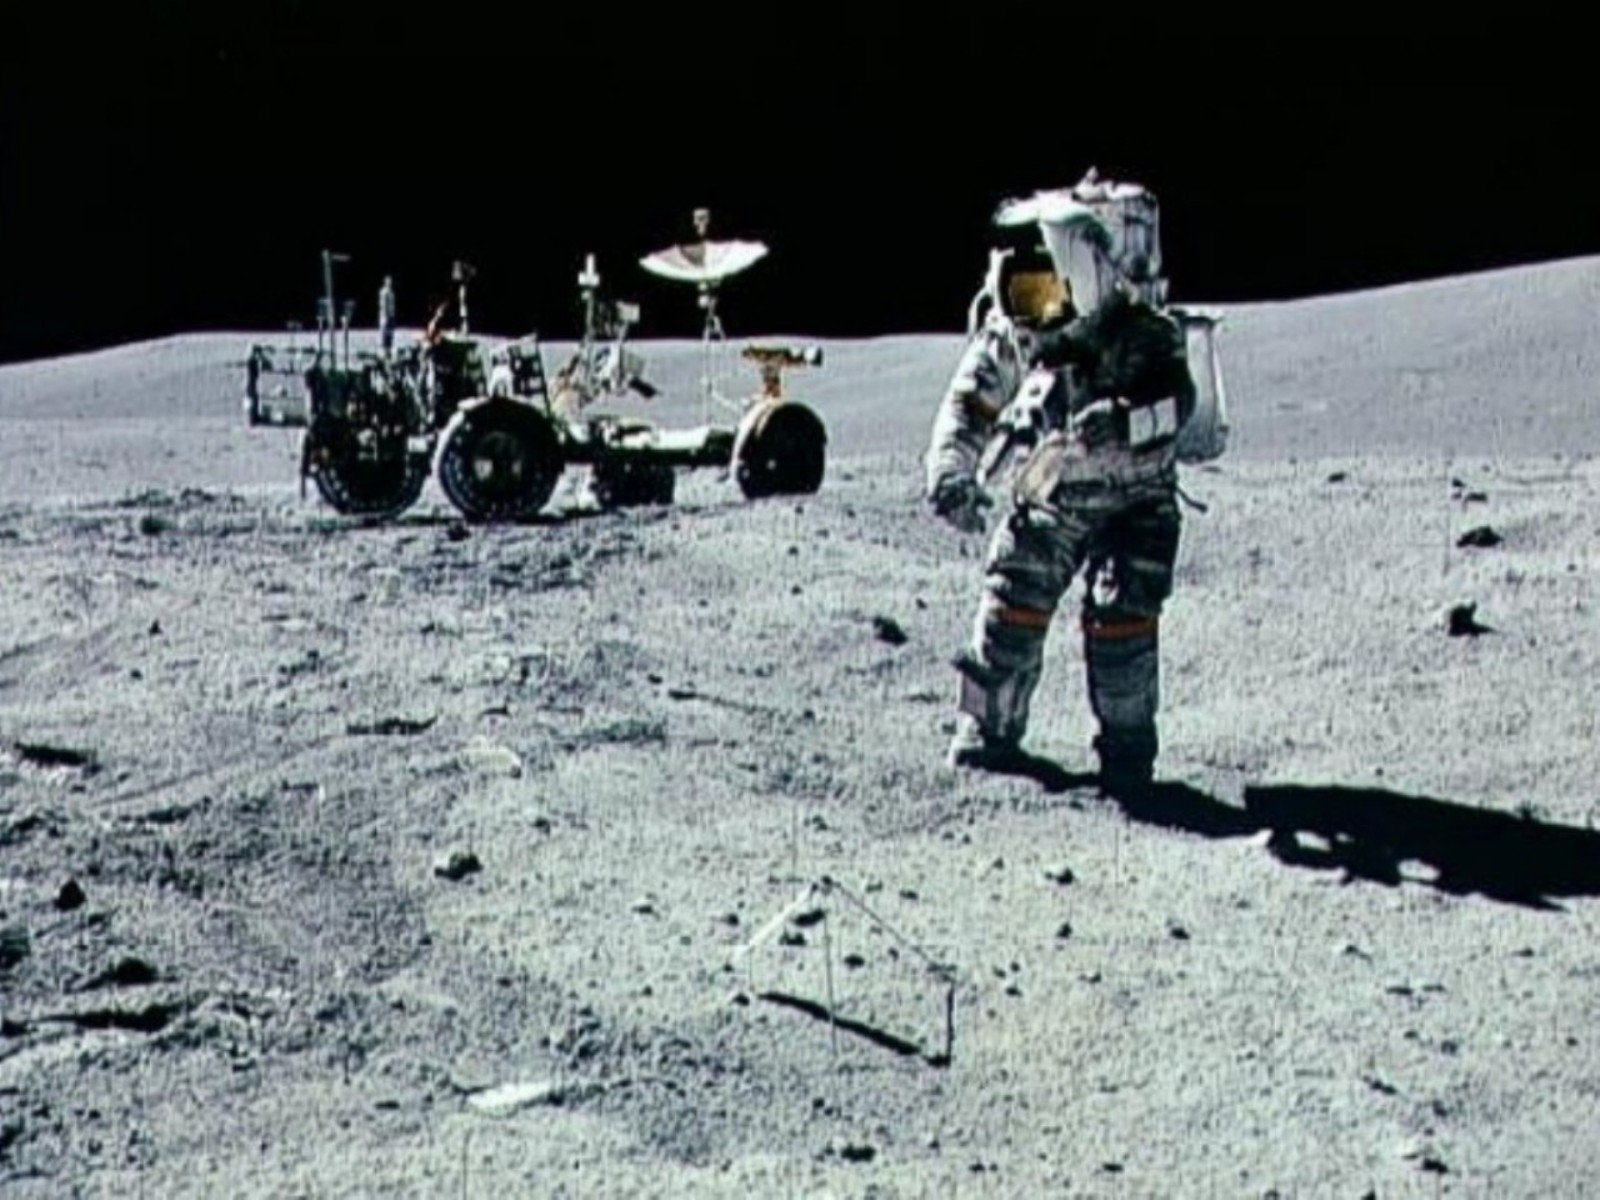 space Moon Astronaut Man Nasa America Mission Apollo 1600x1200